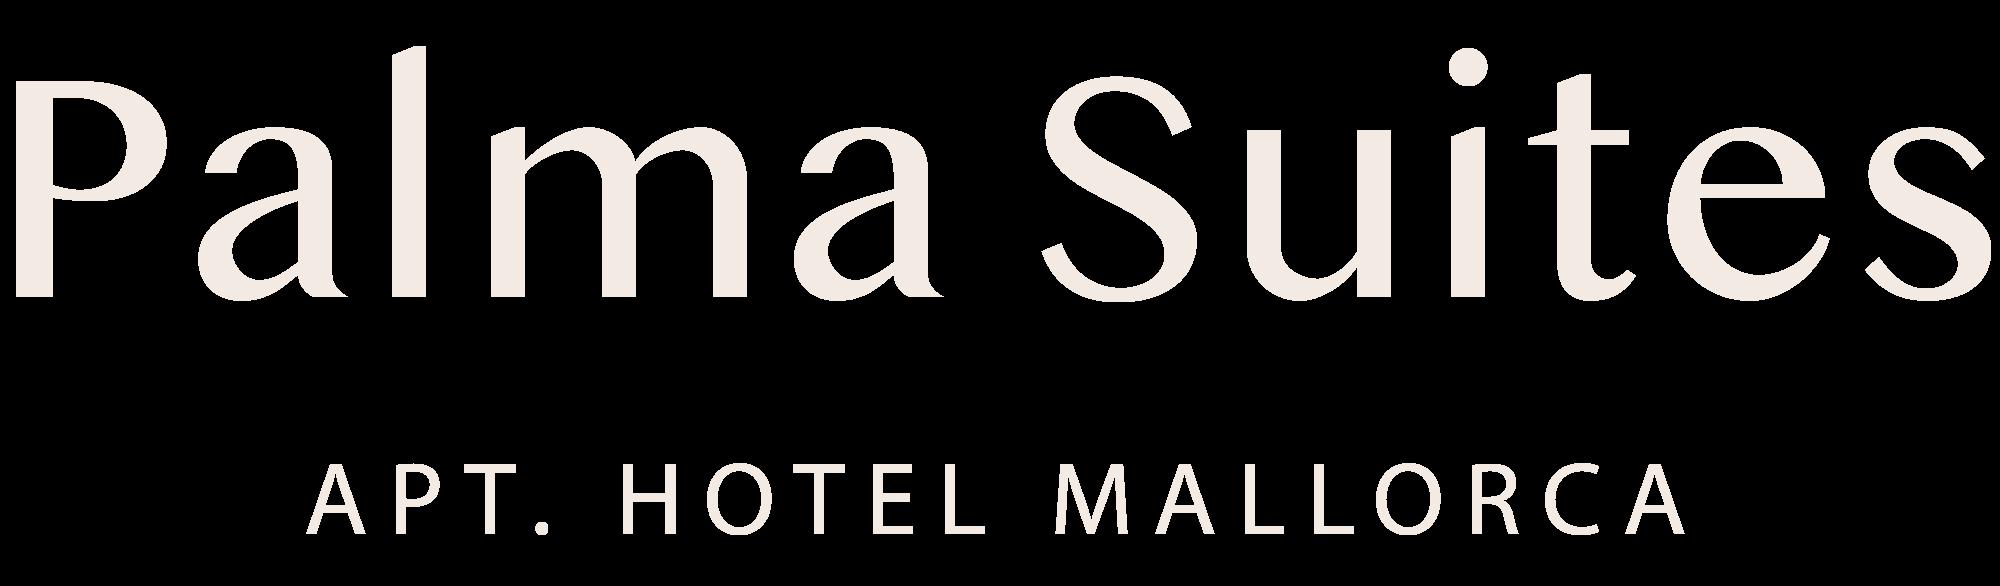 Palma Suites Hotel, Mallorca